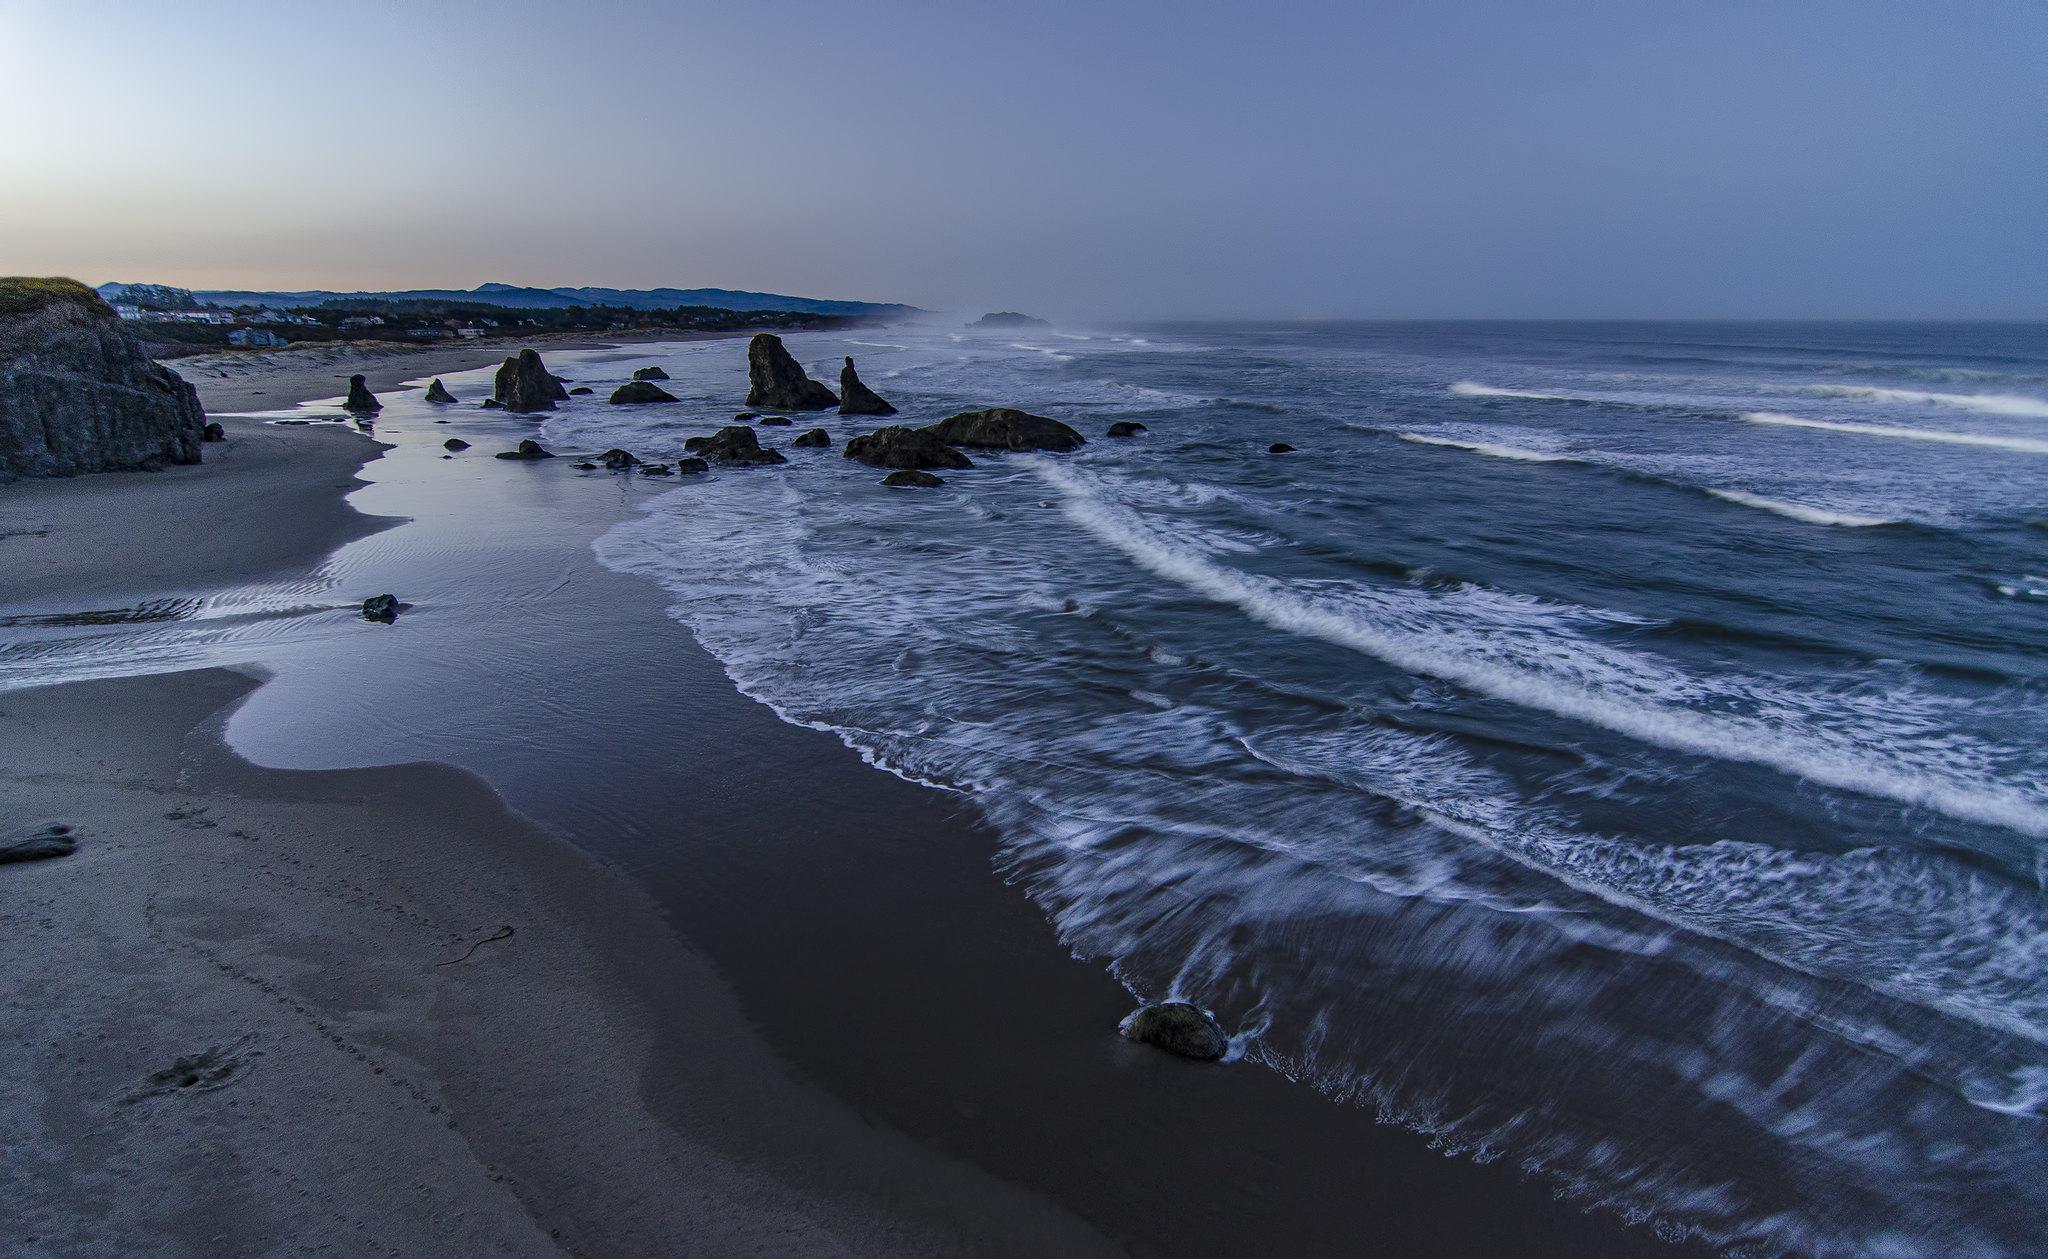 The light fading on the Bandon coastline